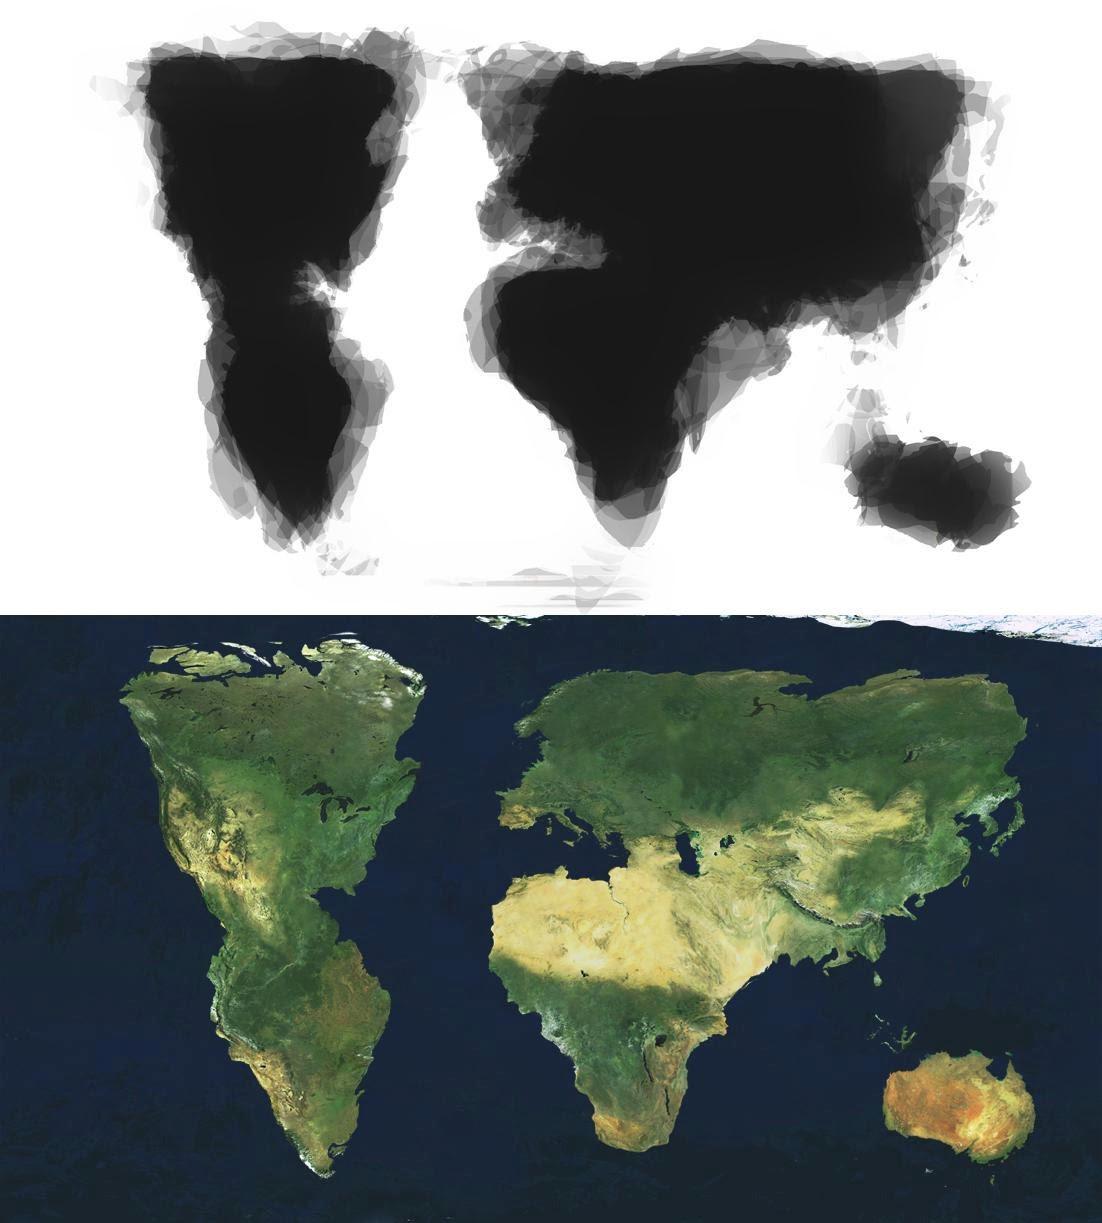 http://kottke.org/17/04/an-average-hand-drawn-map-of-the-world